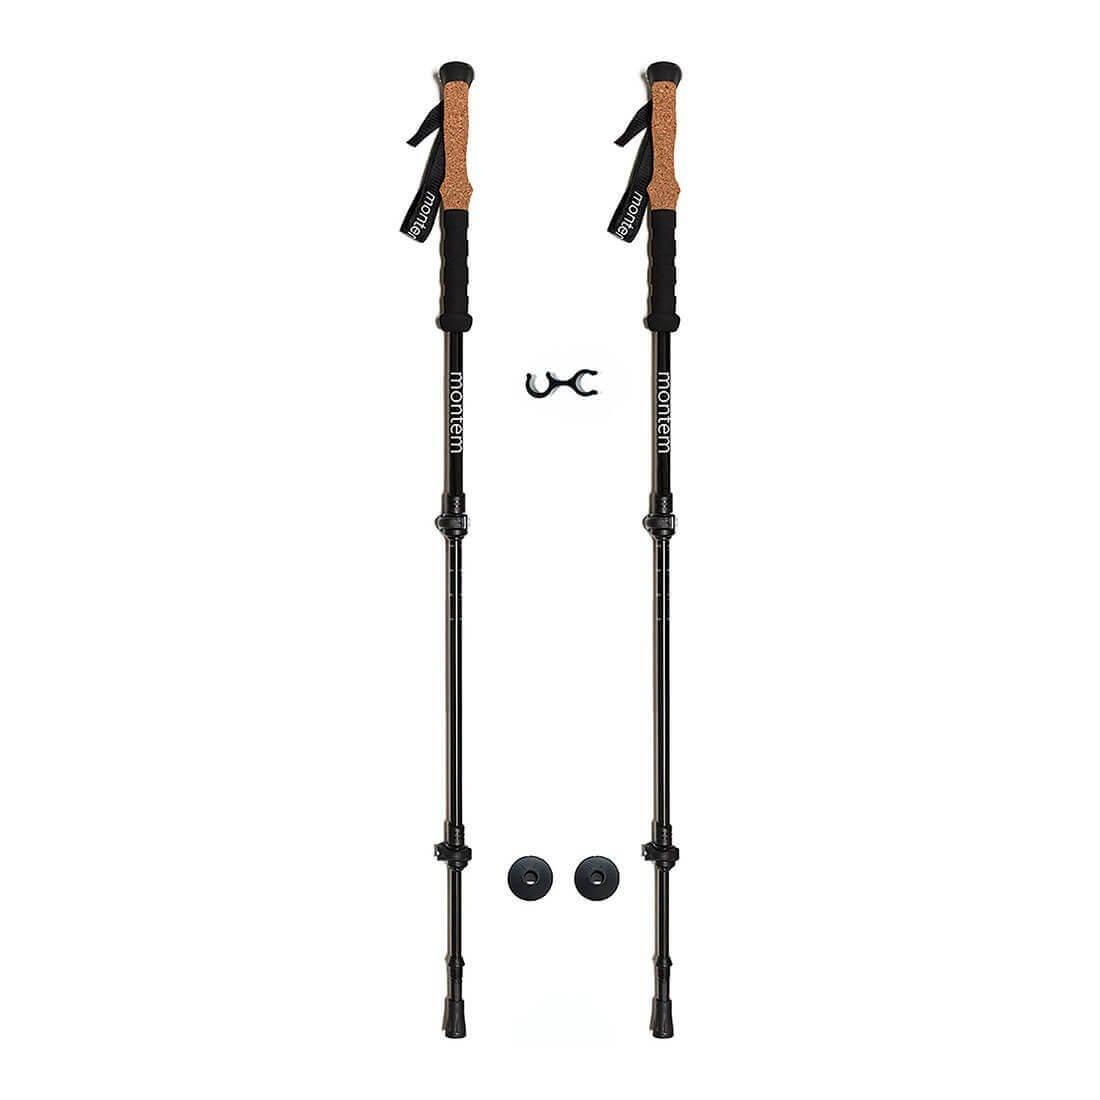 Ultra Strong Cork Anti-Shock Trekking Poles - Pair